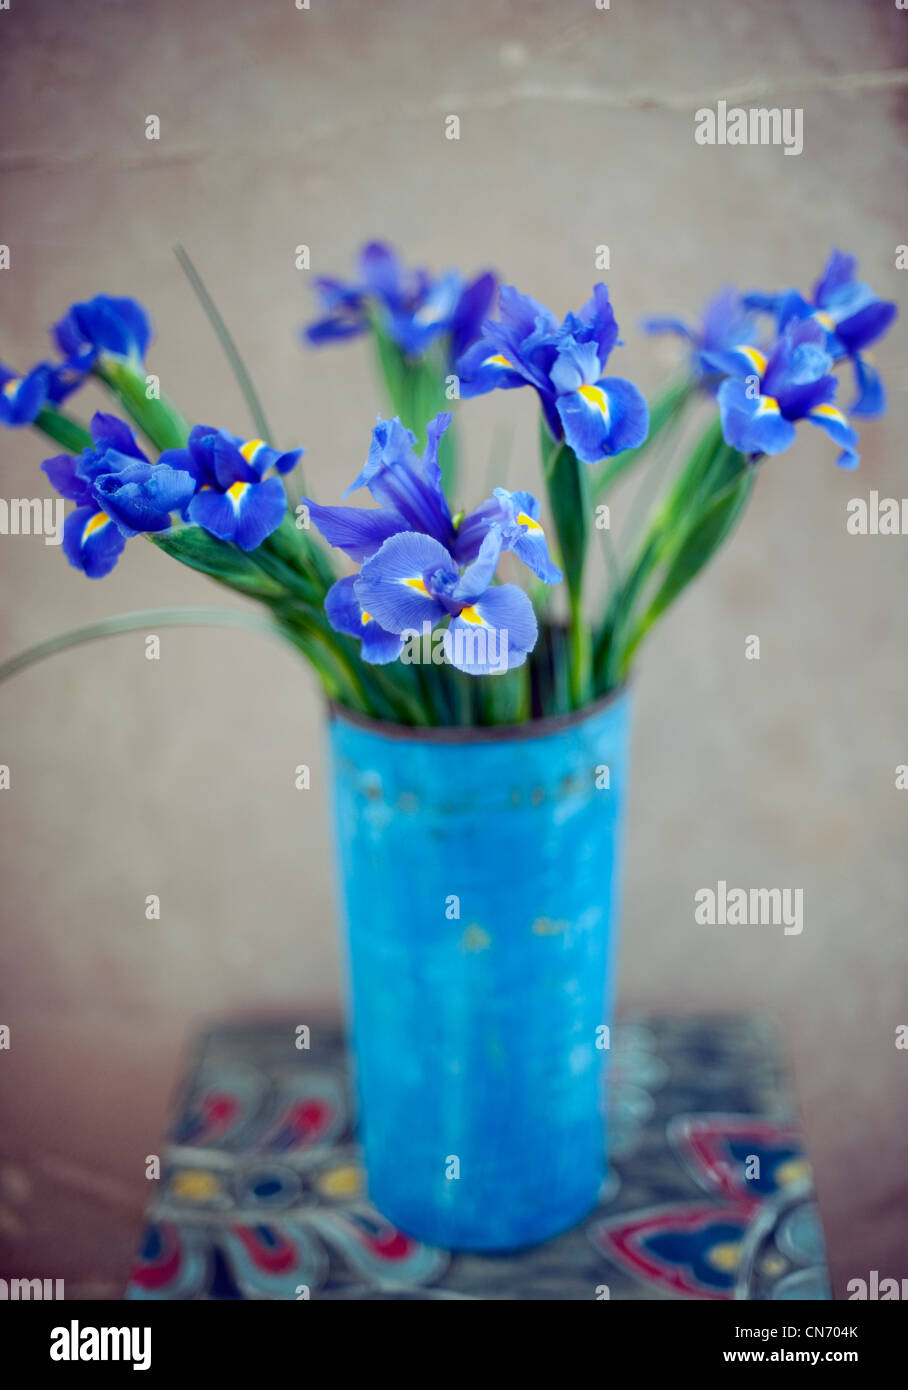 Decor photos decor images alamy for Magasins de robe de mariage portland oregon